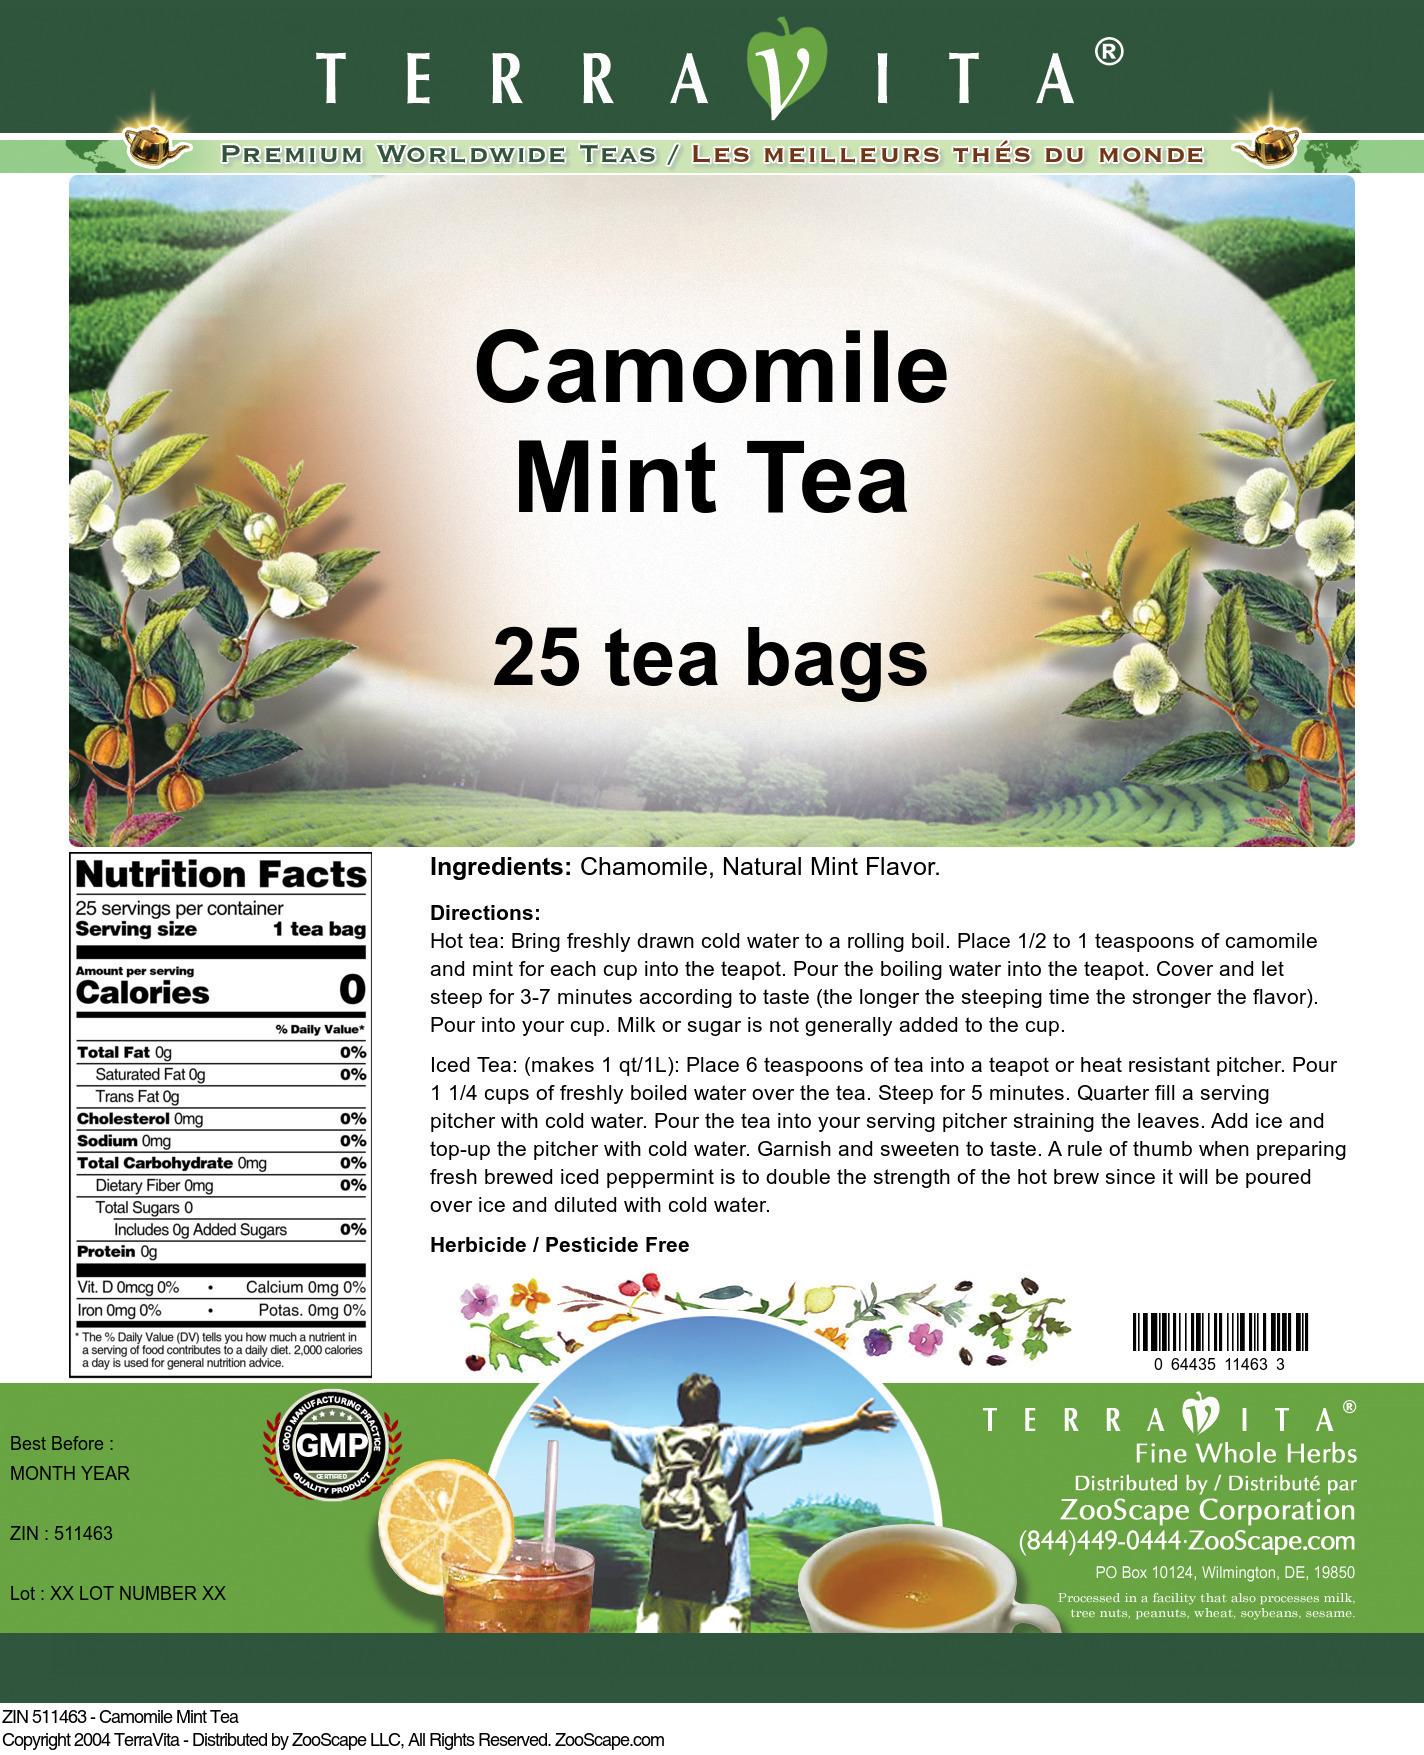 Camomile Mint Tea